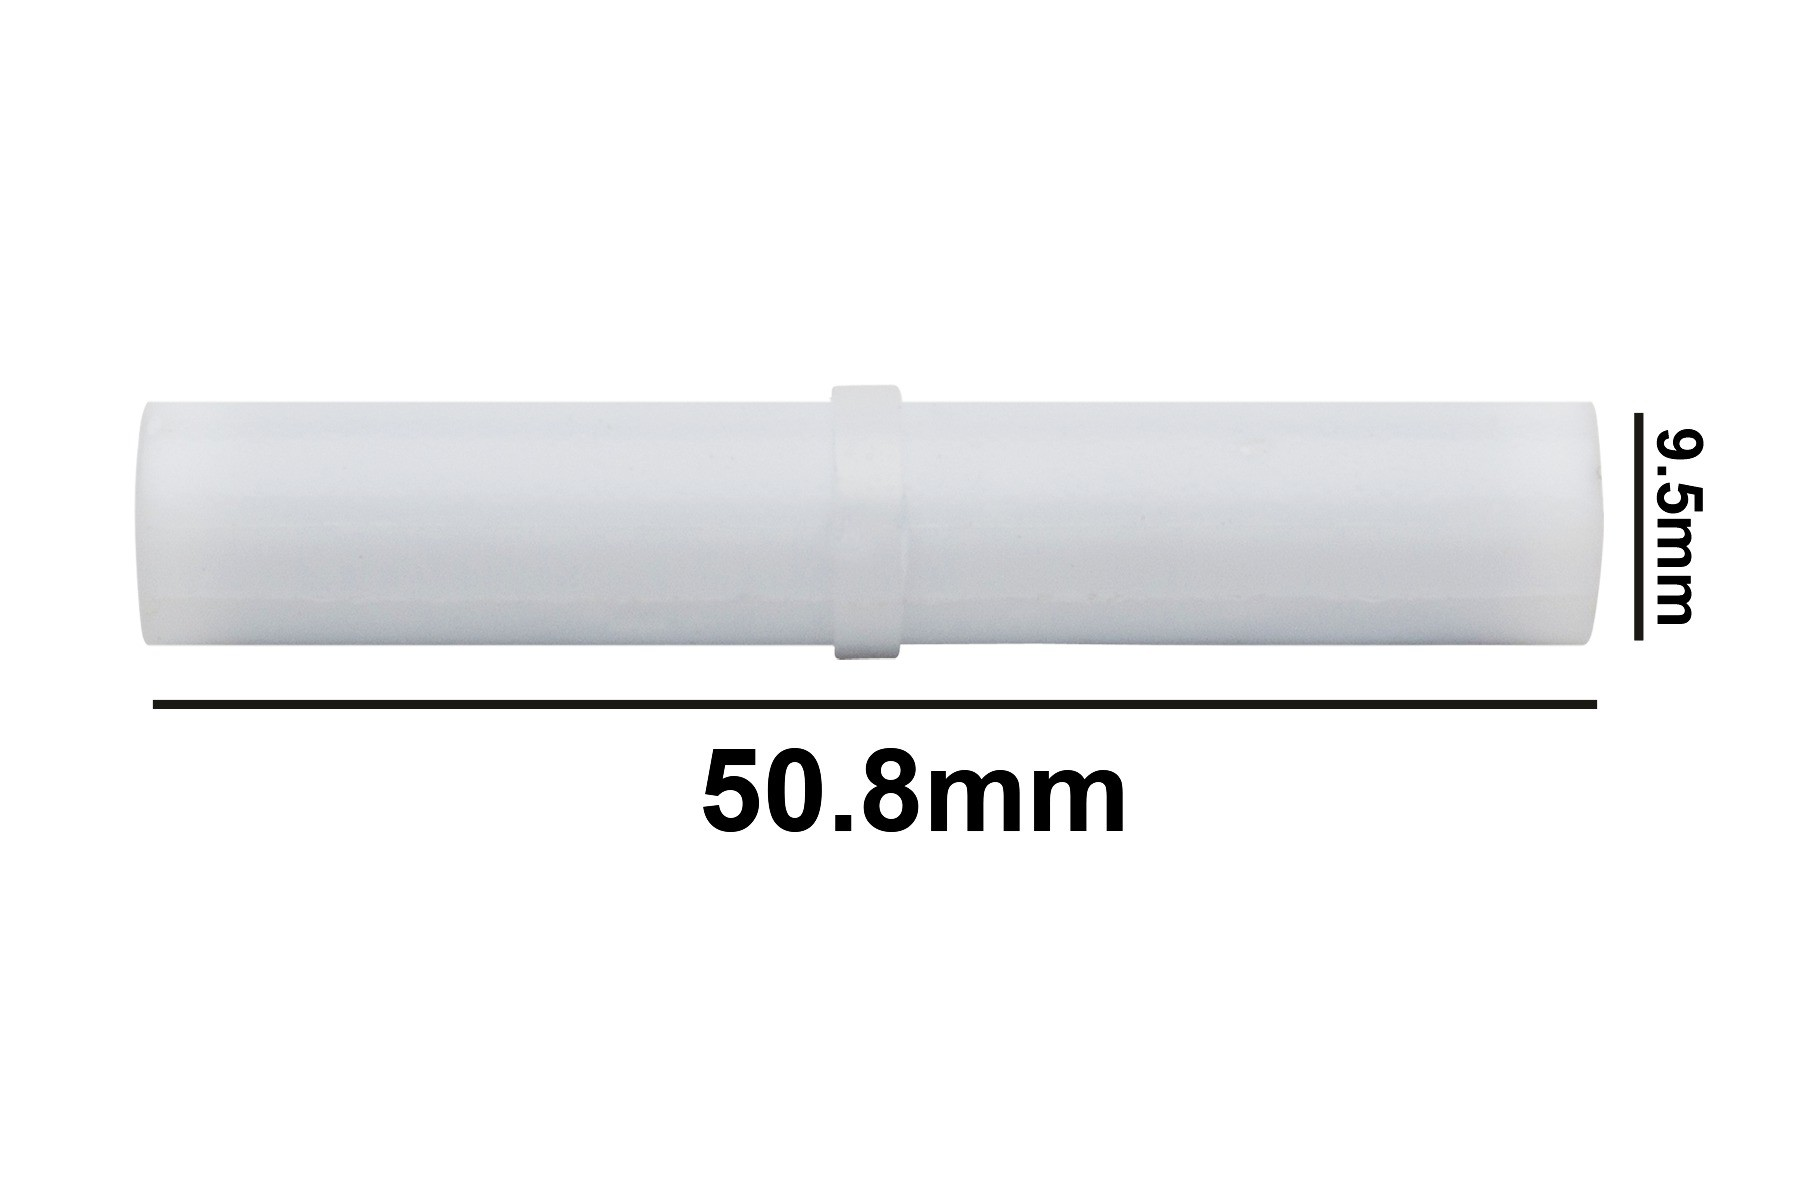 SP Bel-Art Spinbar Teflon Cylindrical Magnetic Stirring Bar; 50.8 x 9.5mm, White